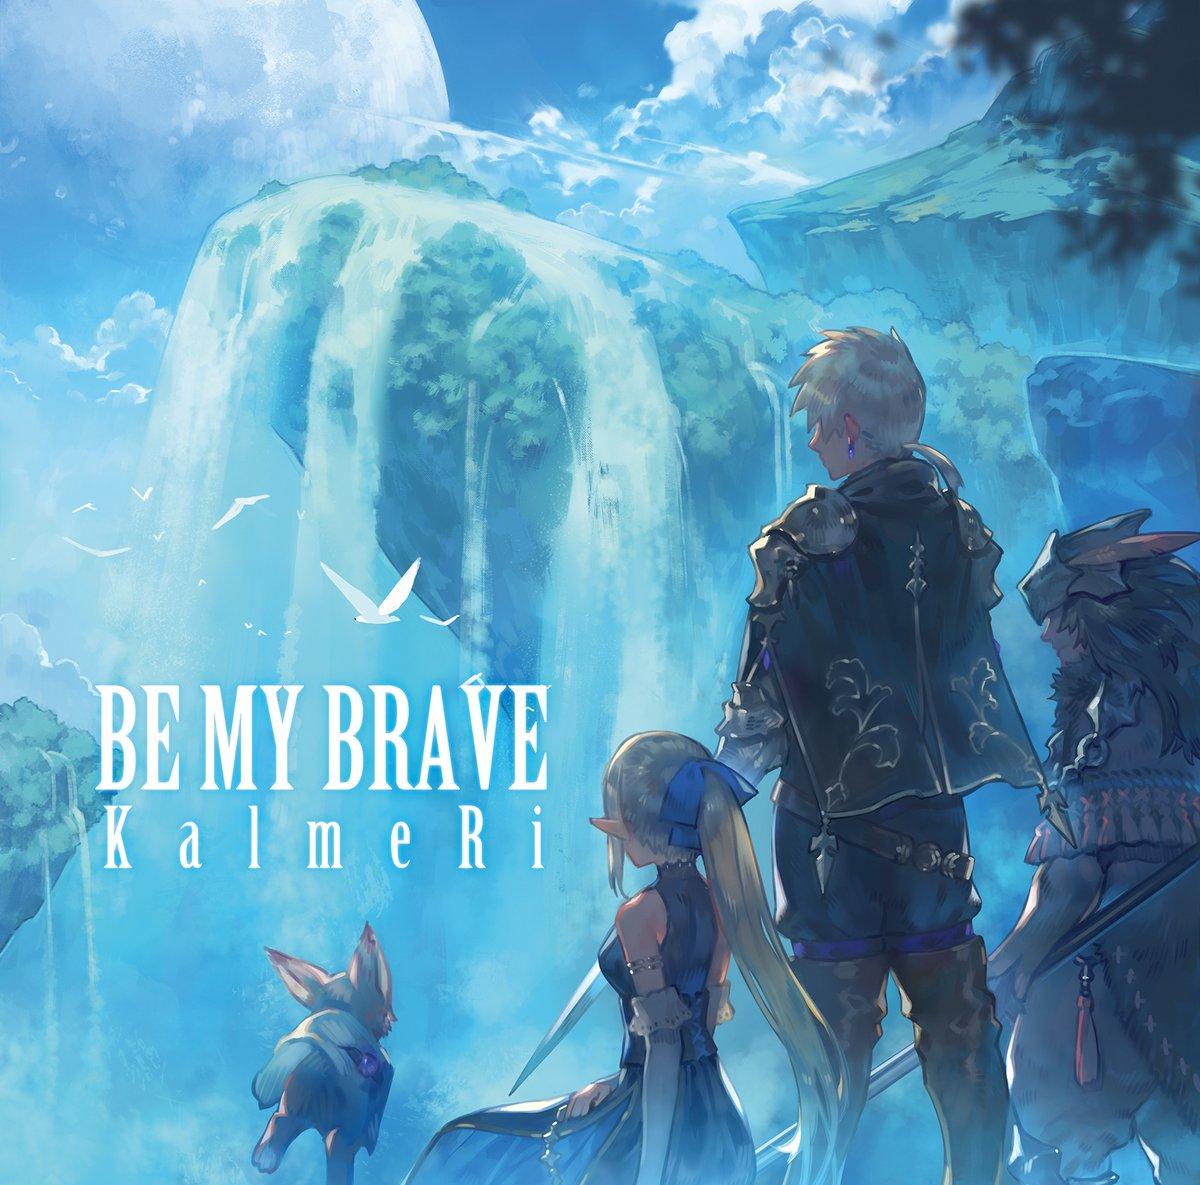 BE MY BRAVE